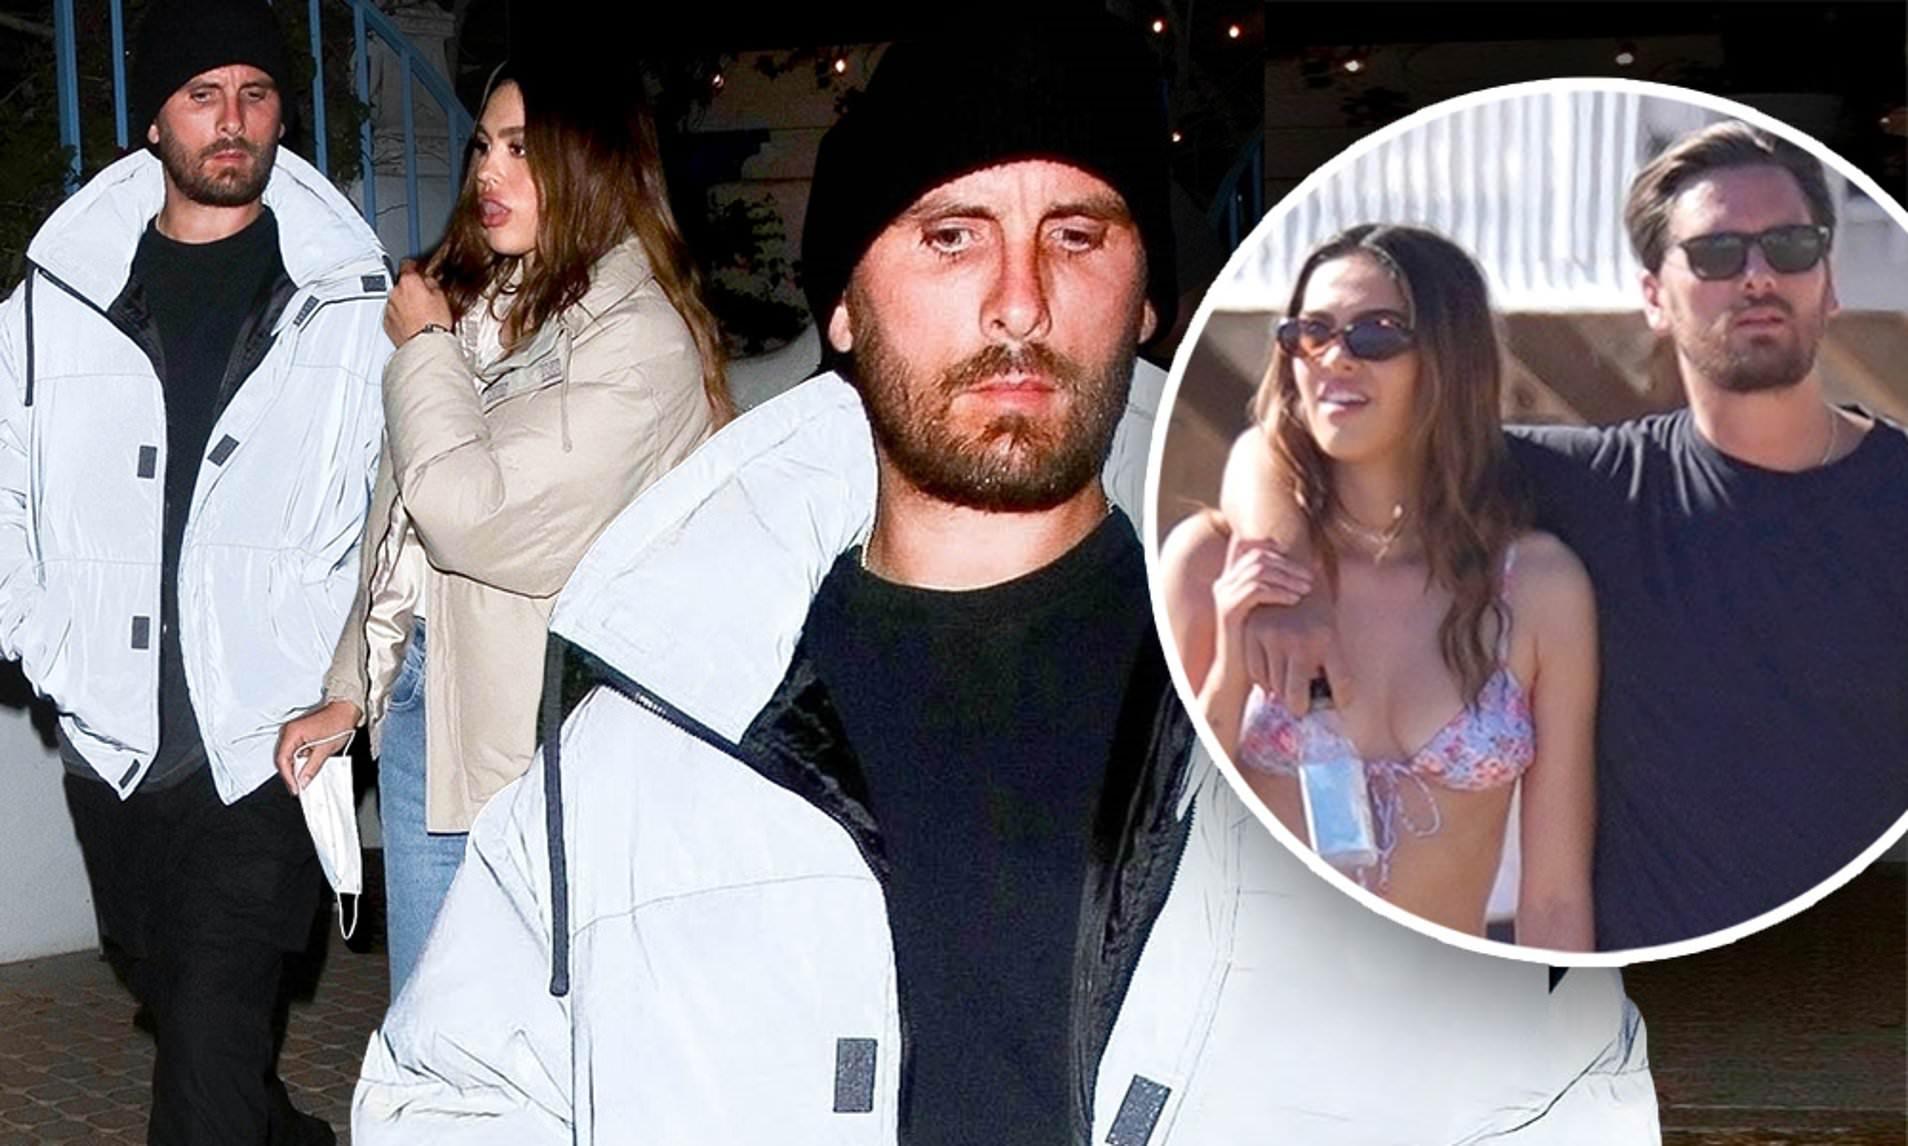 Kourtney Kardashian Reacts to Scott Disick Secret TEEN GF Amelia Hamlin